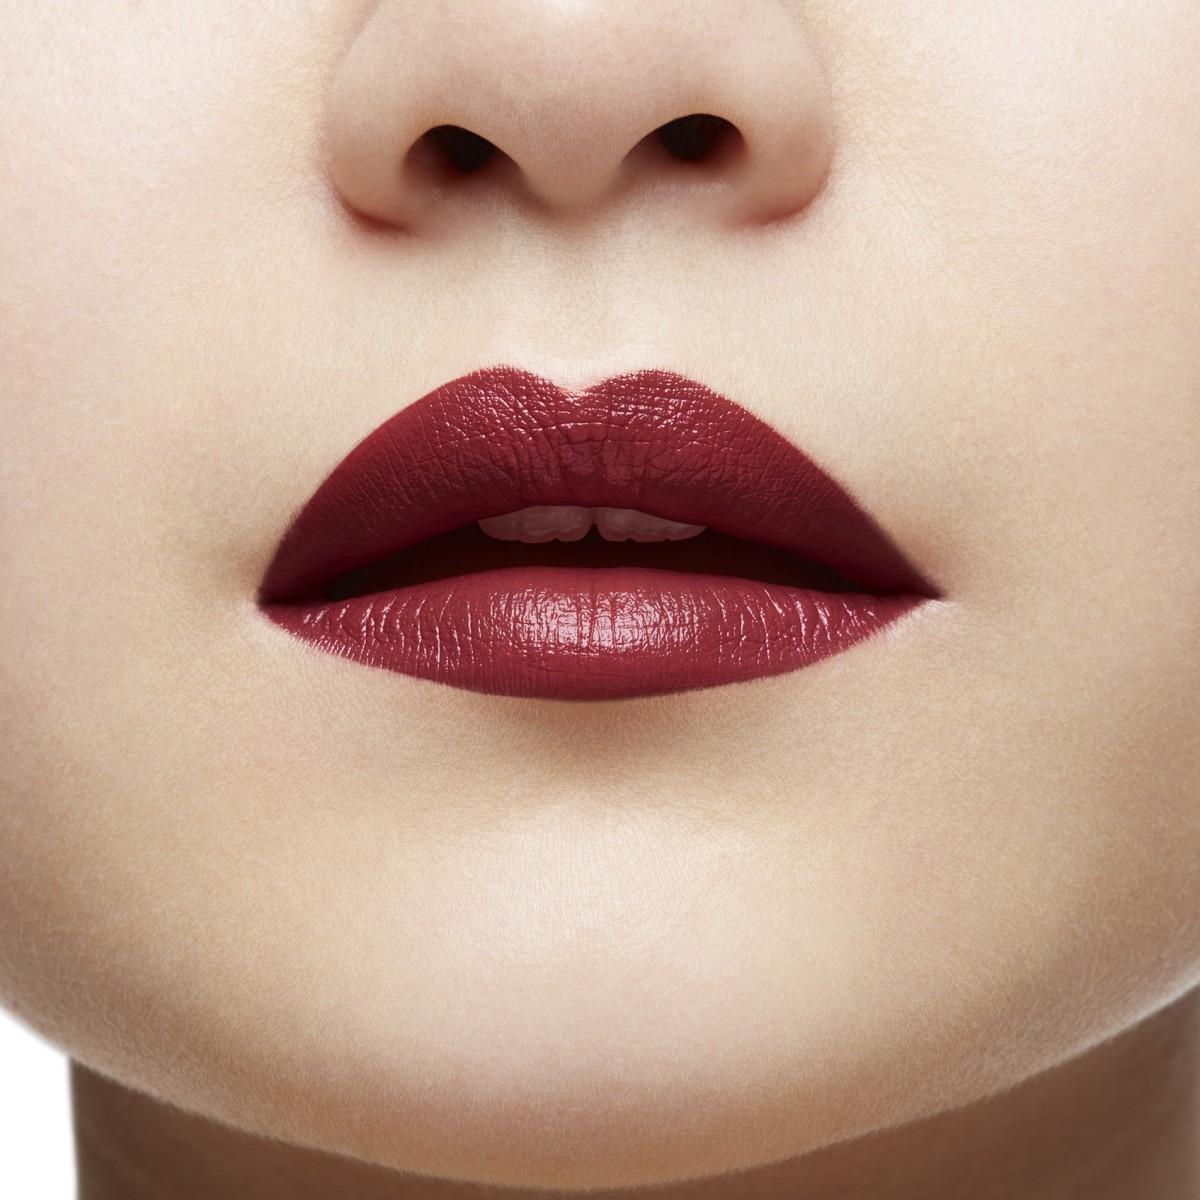 Beauty - Very Prive - Christian Louboutin